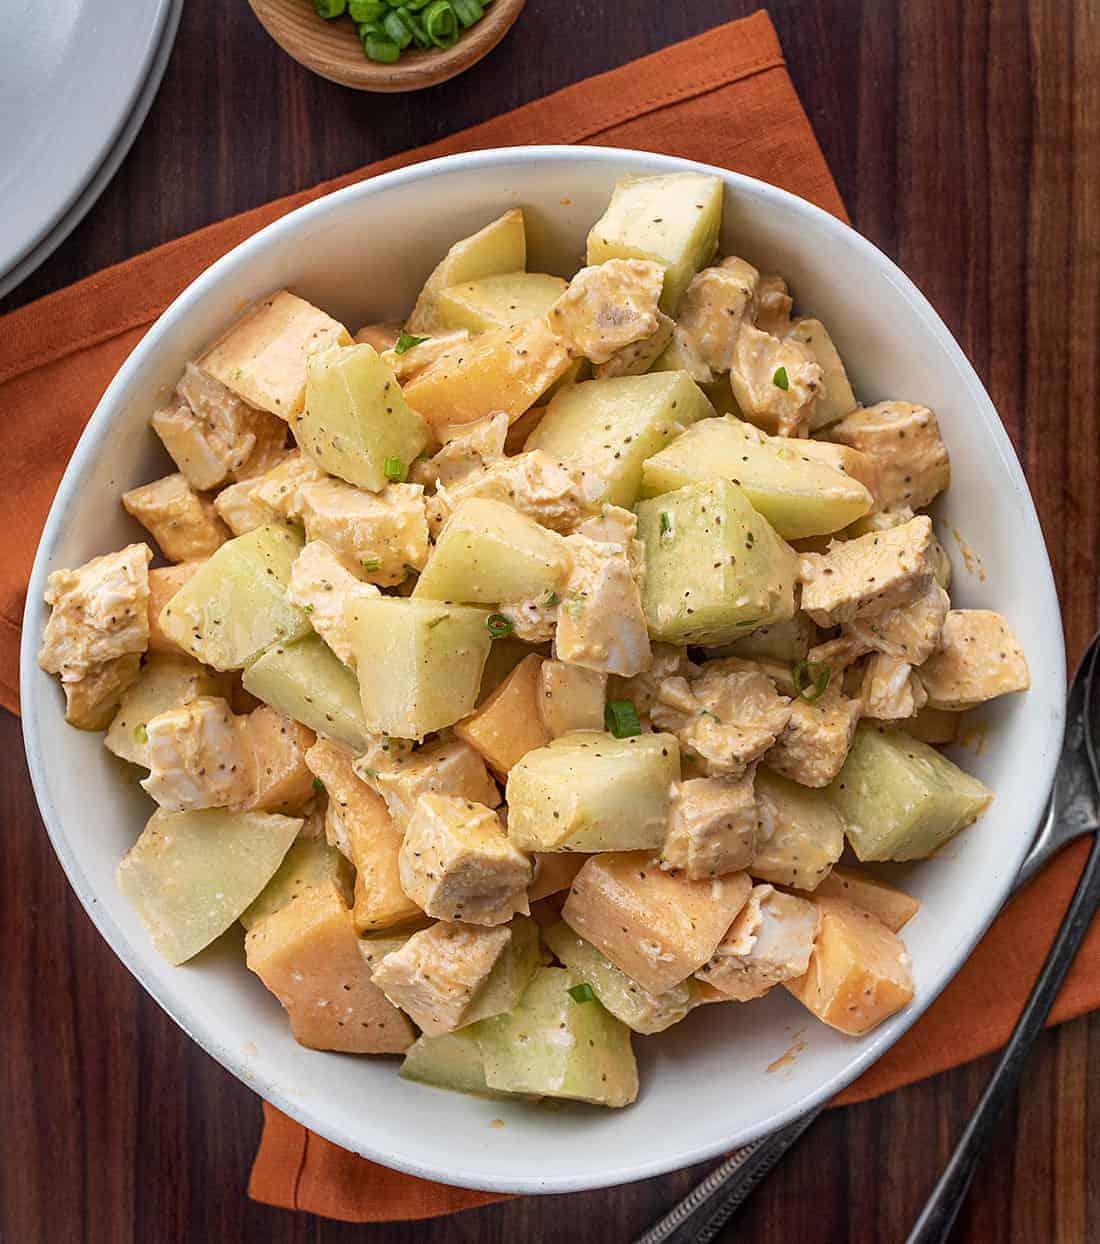 Overhead Image of Cantaloupe Honey Dew Salad - Melon Salad